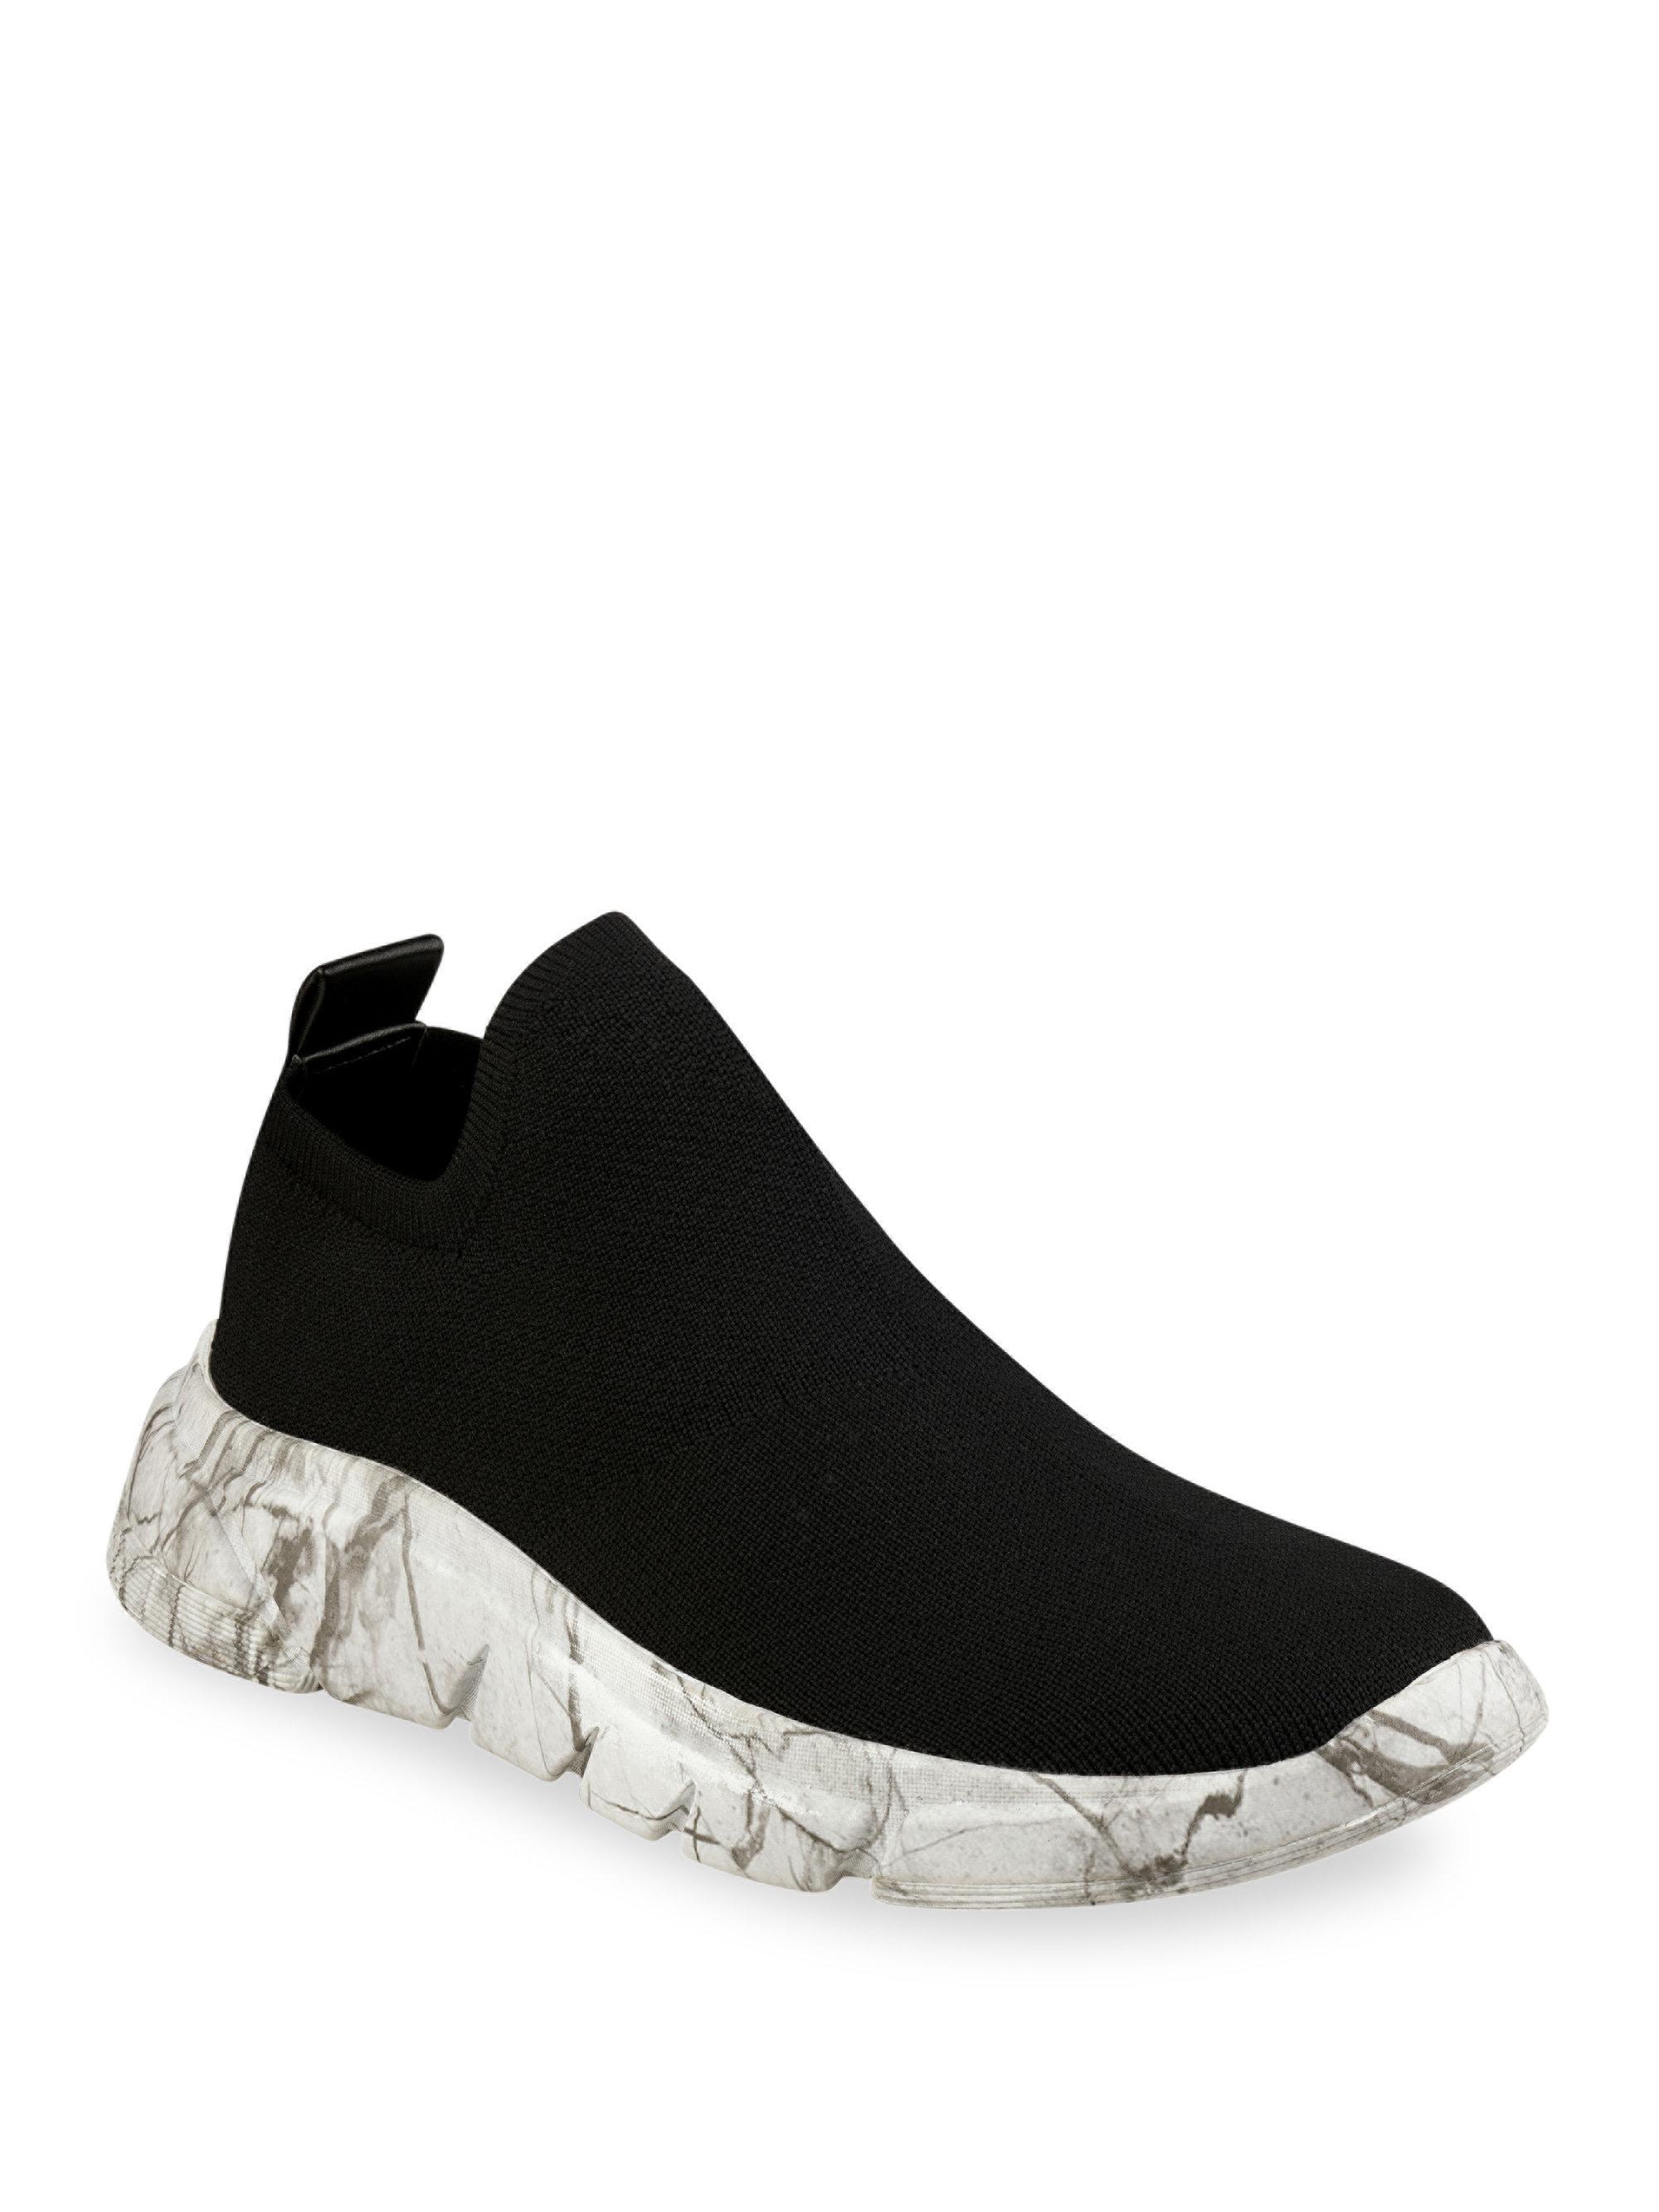 KENDALL + KYLIE CALEB - Slip-ons - black/white